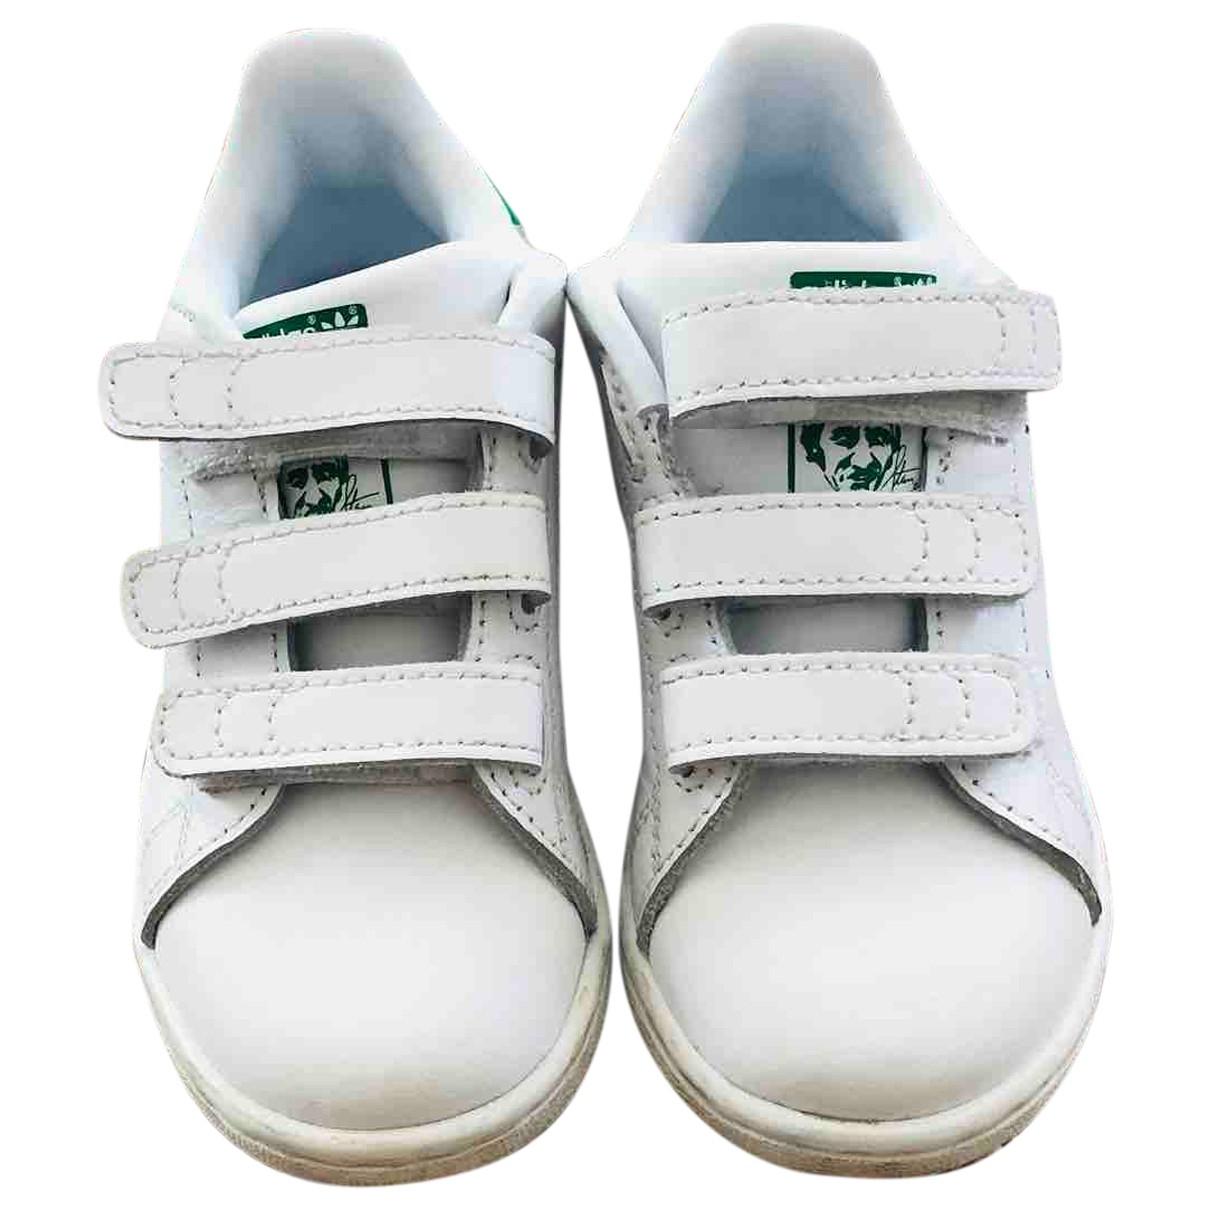 Adidas - Baskets Stan Smith pour enfant en cuir - blanc